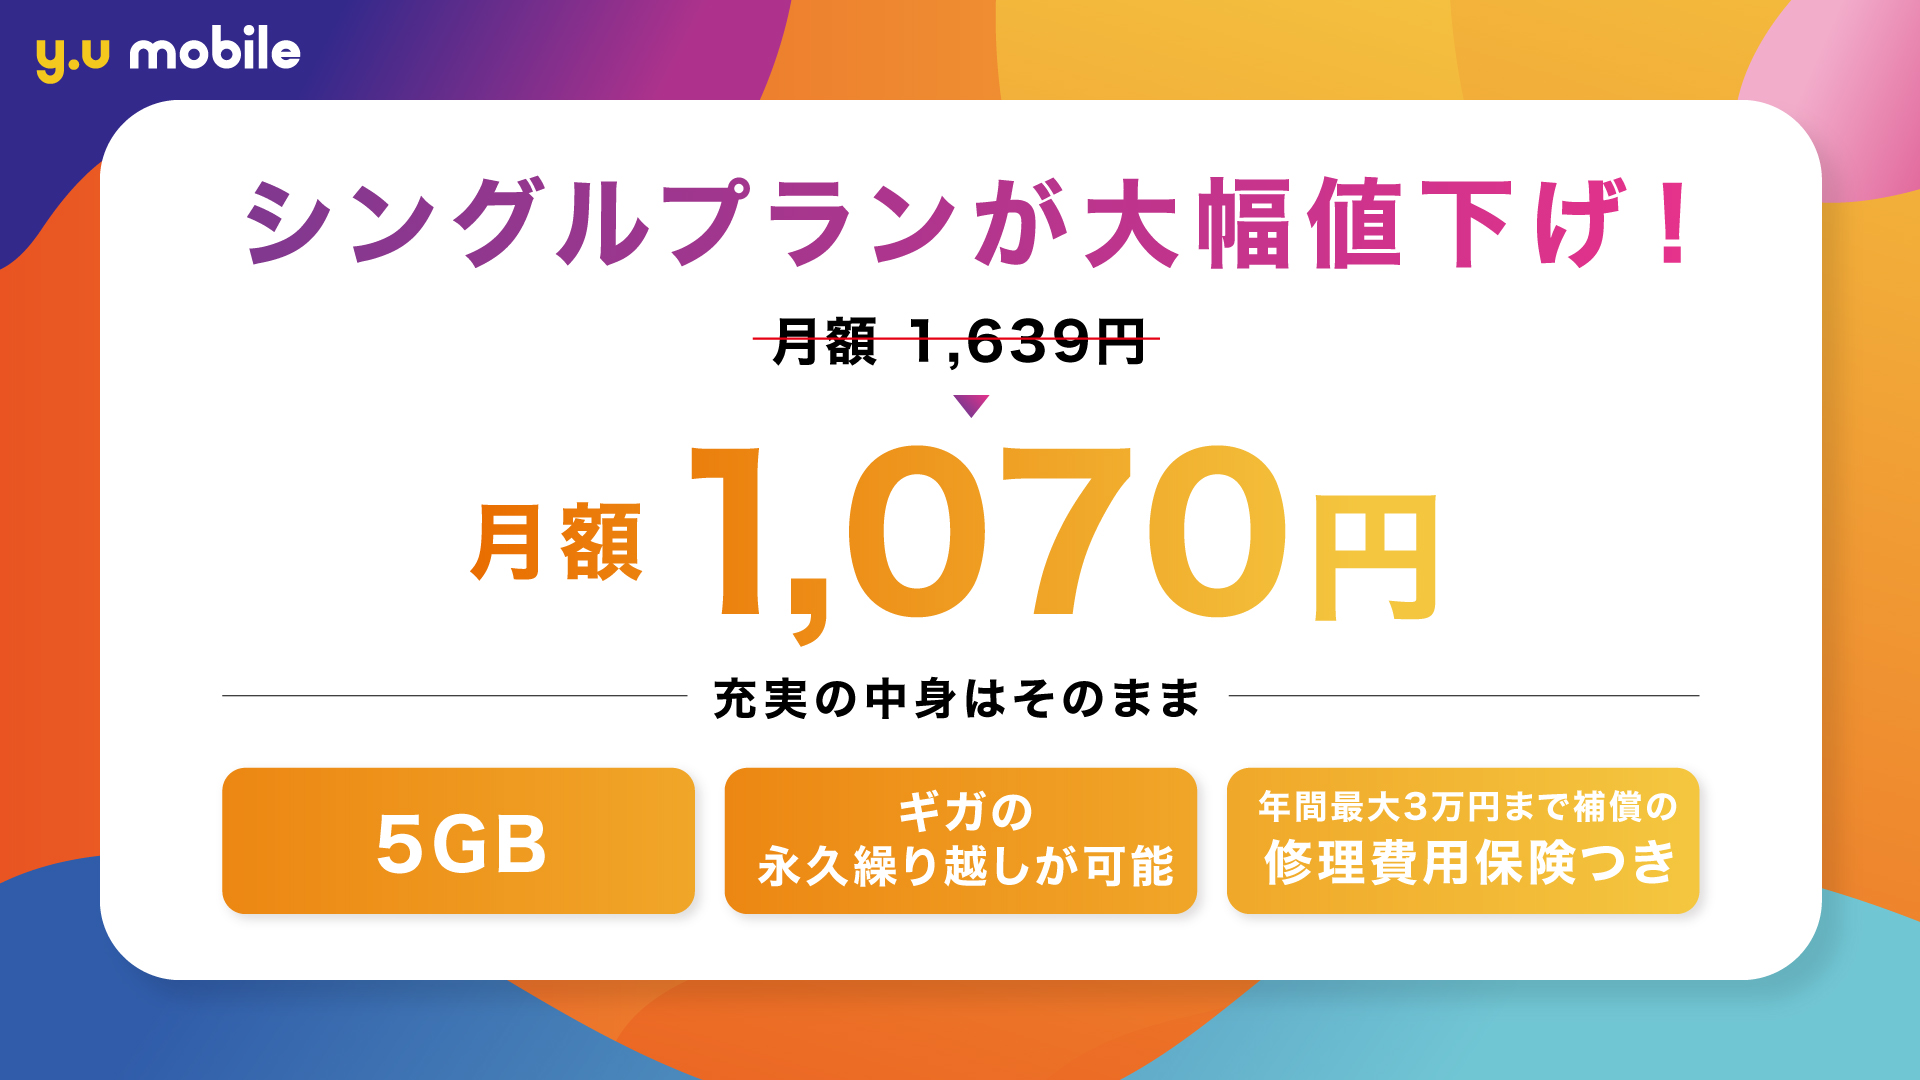 2021年10月y.u mobile料金改定